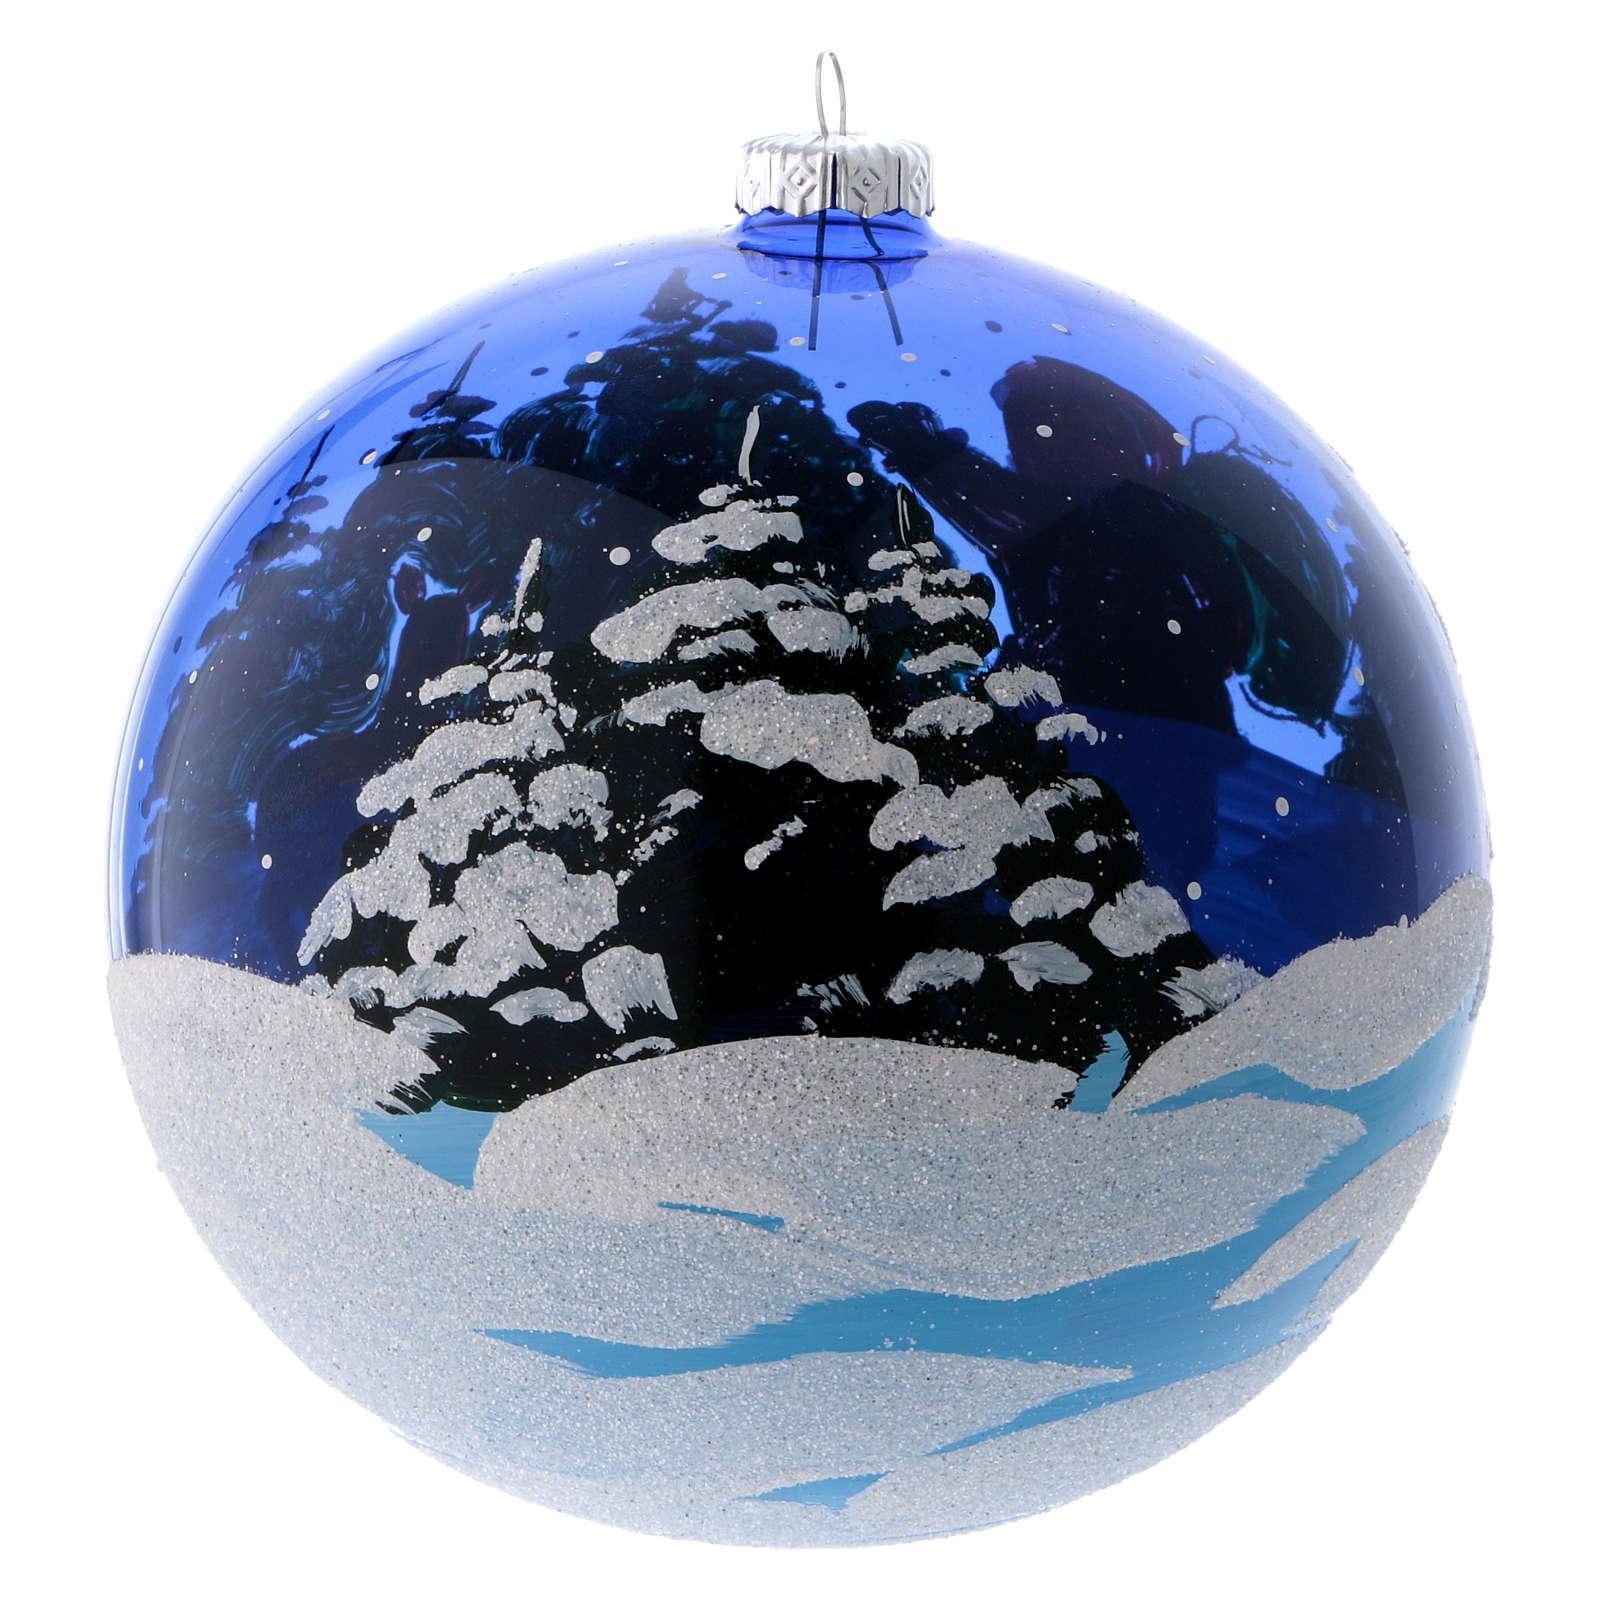 Bola Árbol vidrio azul transparente Dones de Papá Noel 150 mm 4